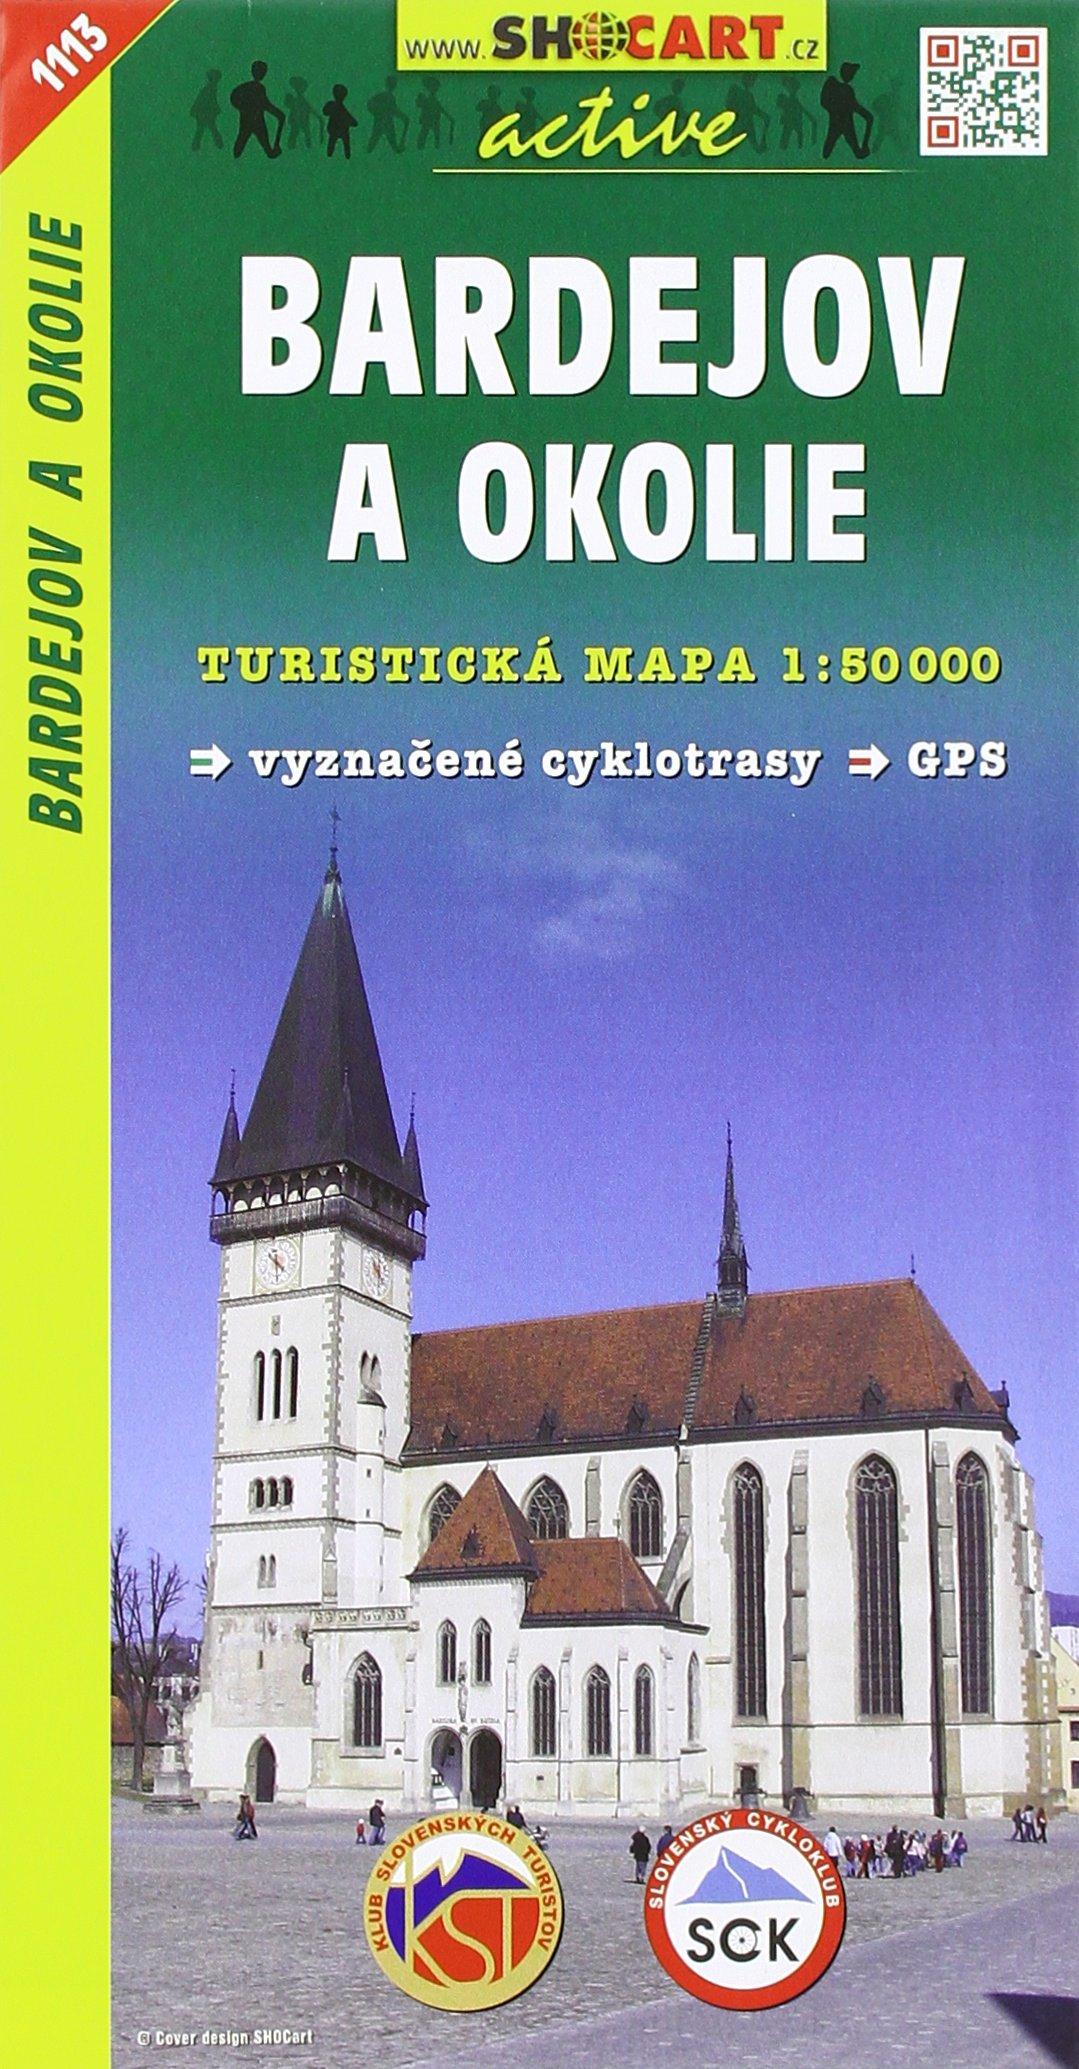 Bardejov a okolie 1:50 000 - Turistická mapa SHOCart Slovensko 1113